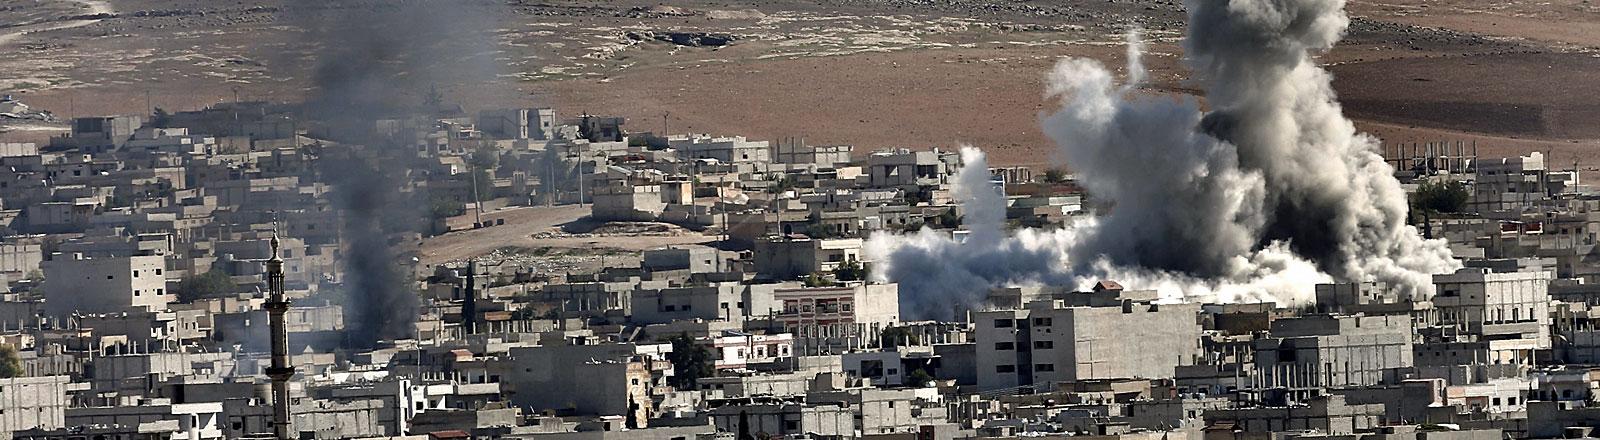 Explosion in Kobane, Syrien